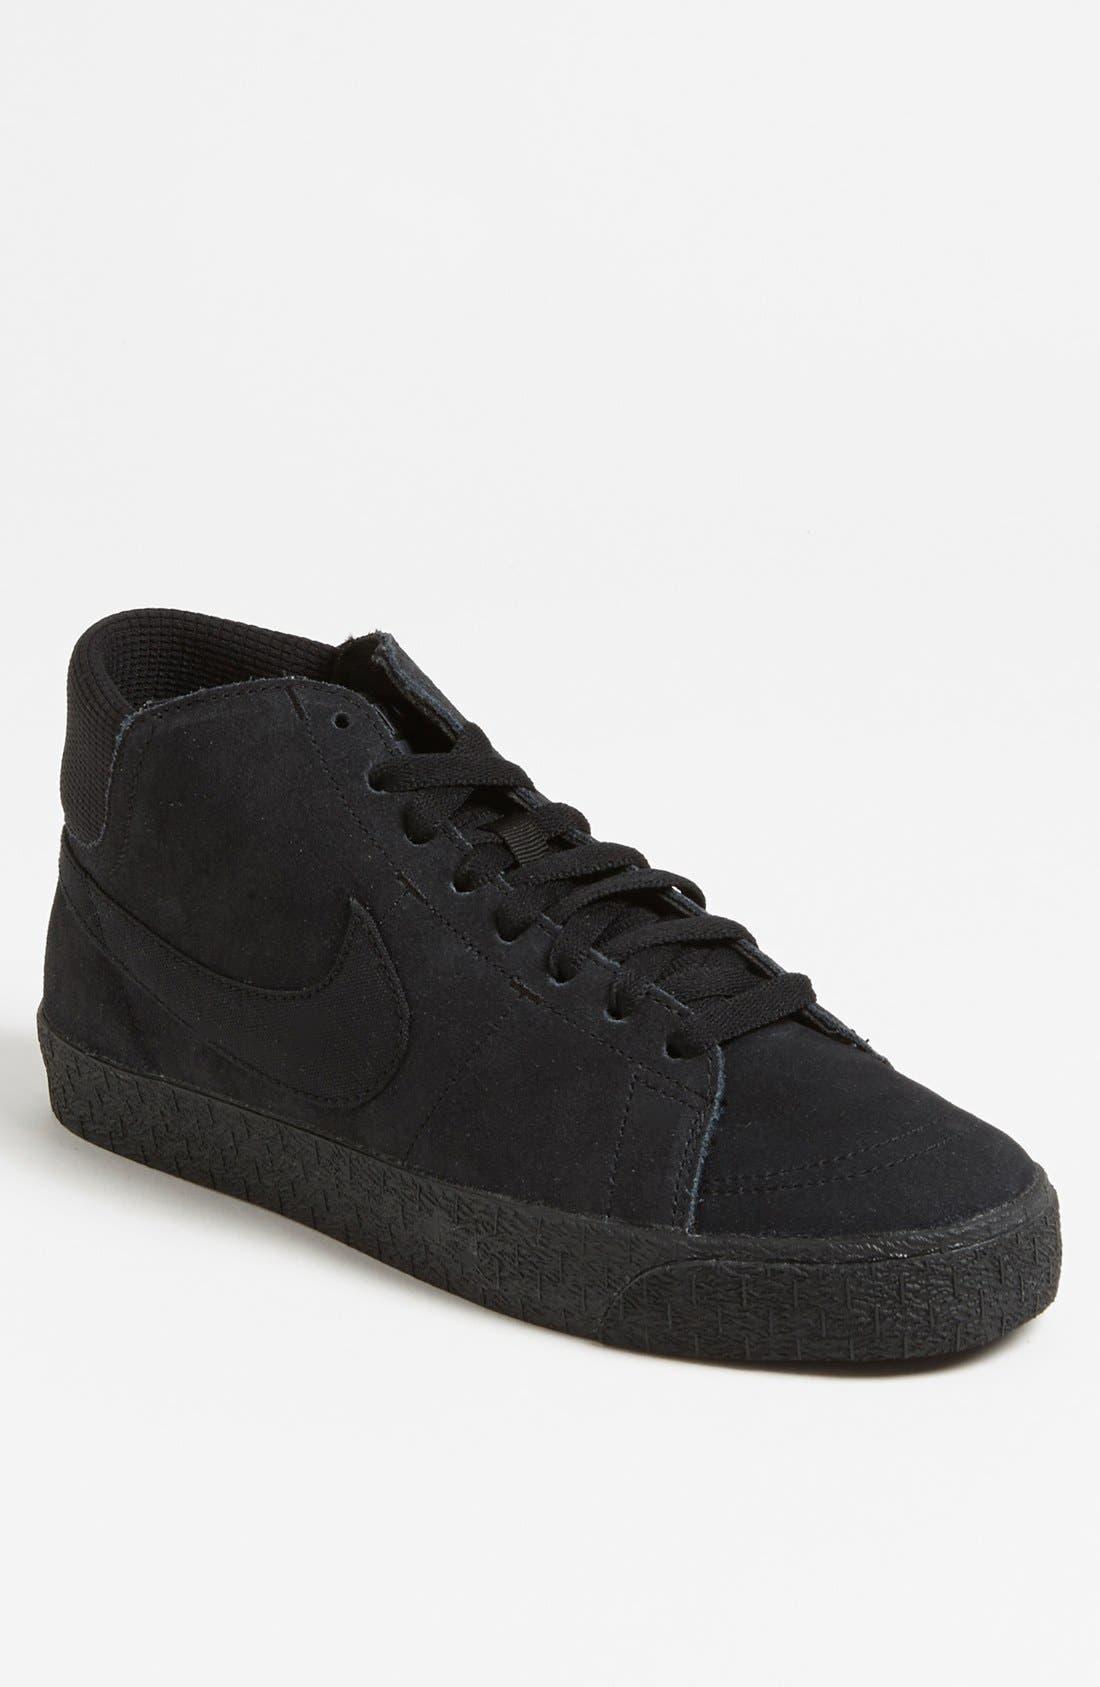 Main Image - Nike 'Blazer Mid LR' Skate Shoe (Men)